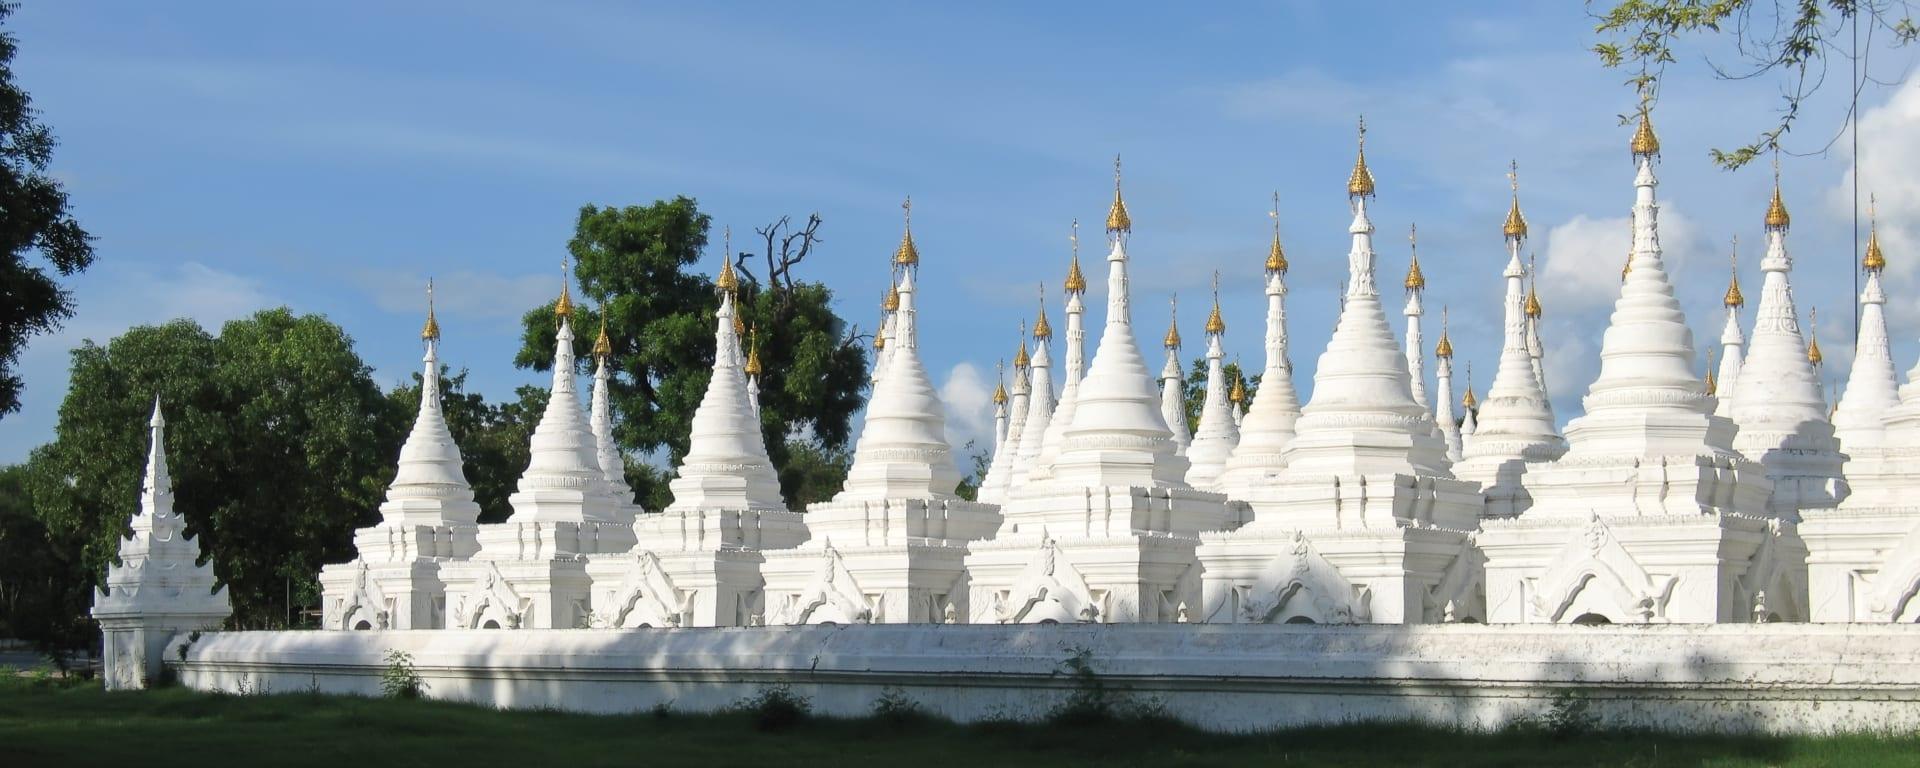 Myanmar entdecken mit Tischler Reisen: Myanmar Mandalay Kuthodaw Tempel